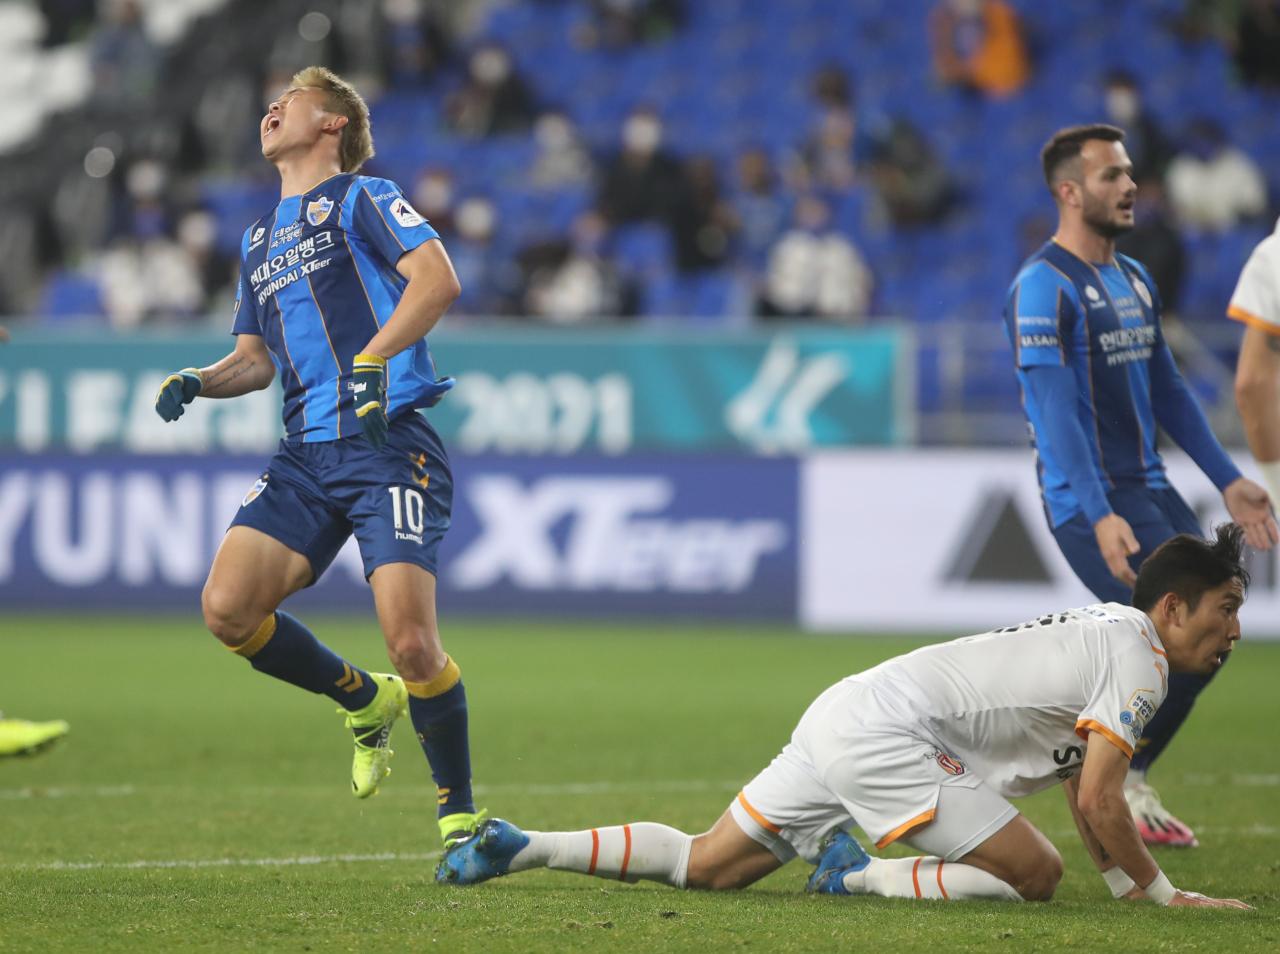 Yoon Bitgaram of Ulsan Hyundai FC (L) reacts to a save by Jeju United goalkeeper Oh Seung-hoon (C) during their K League 1 match at Ulsan Munsu Football Stadium in Ulsan, 415 kilometers southeast of Seoul, last Tuesday. (Yonhap)